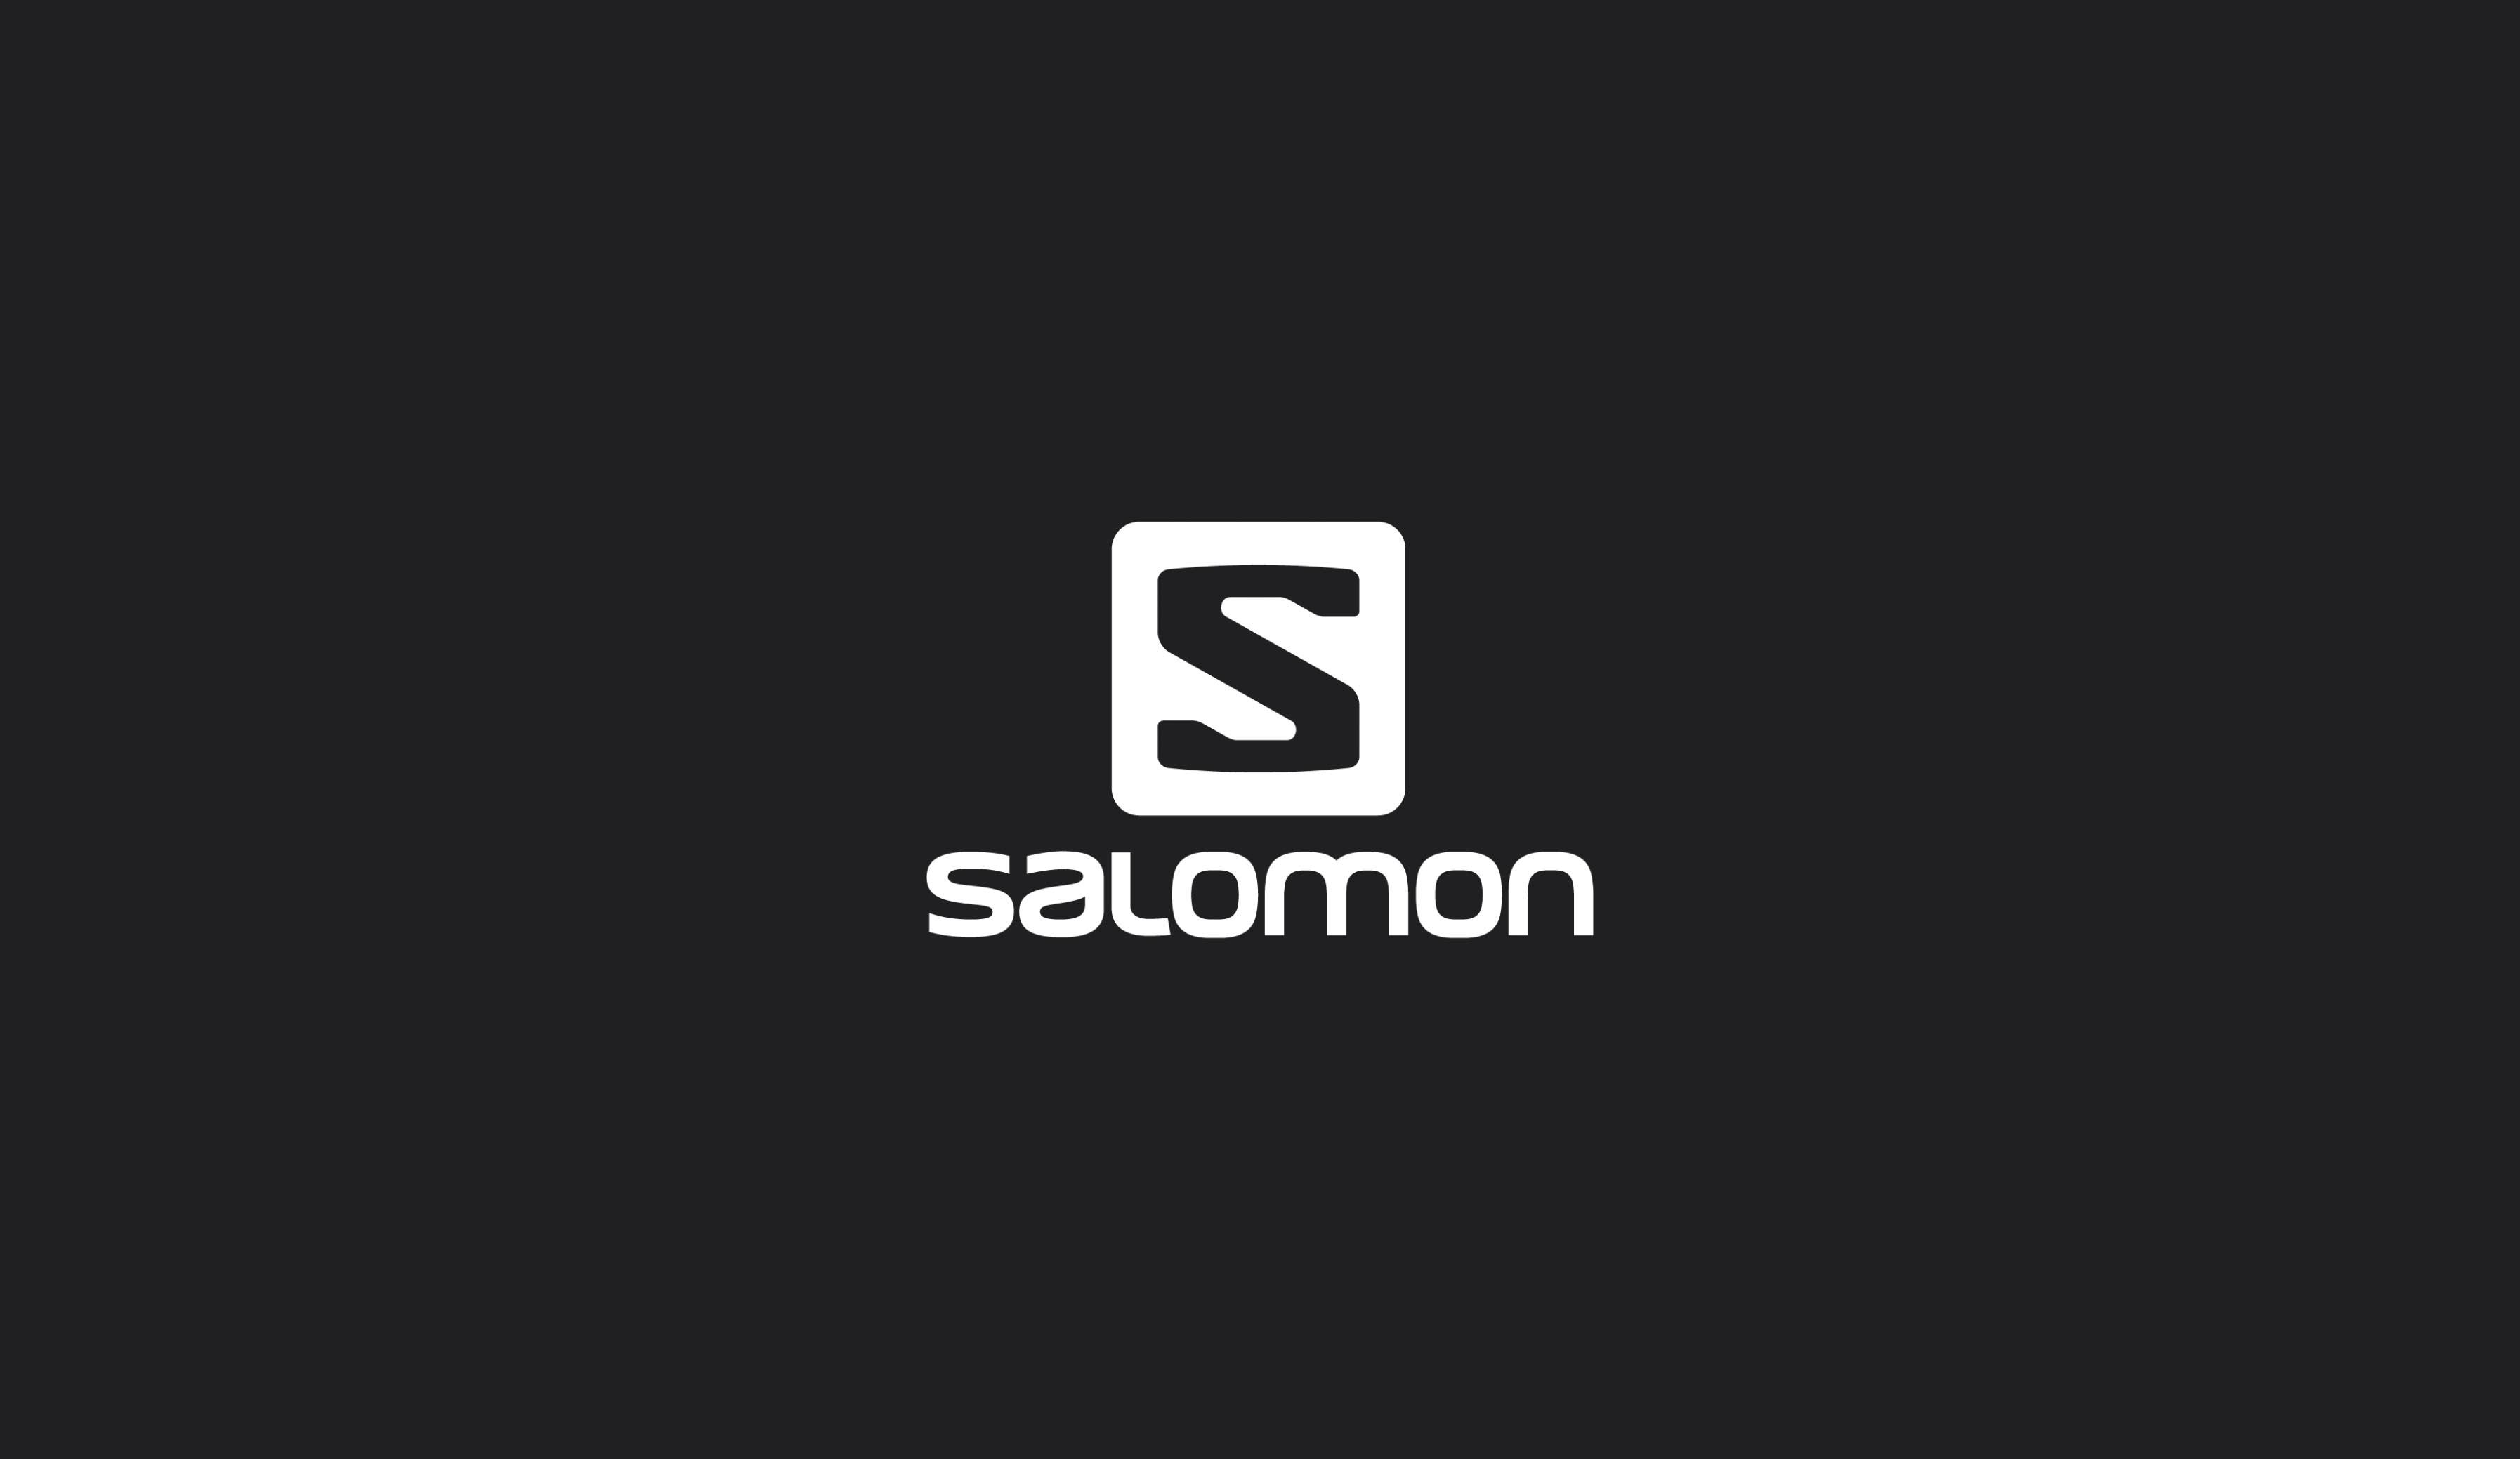 Salomon logo design